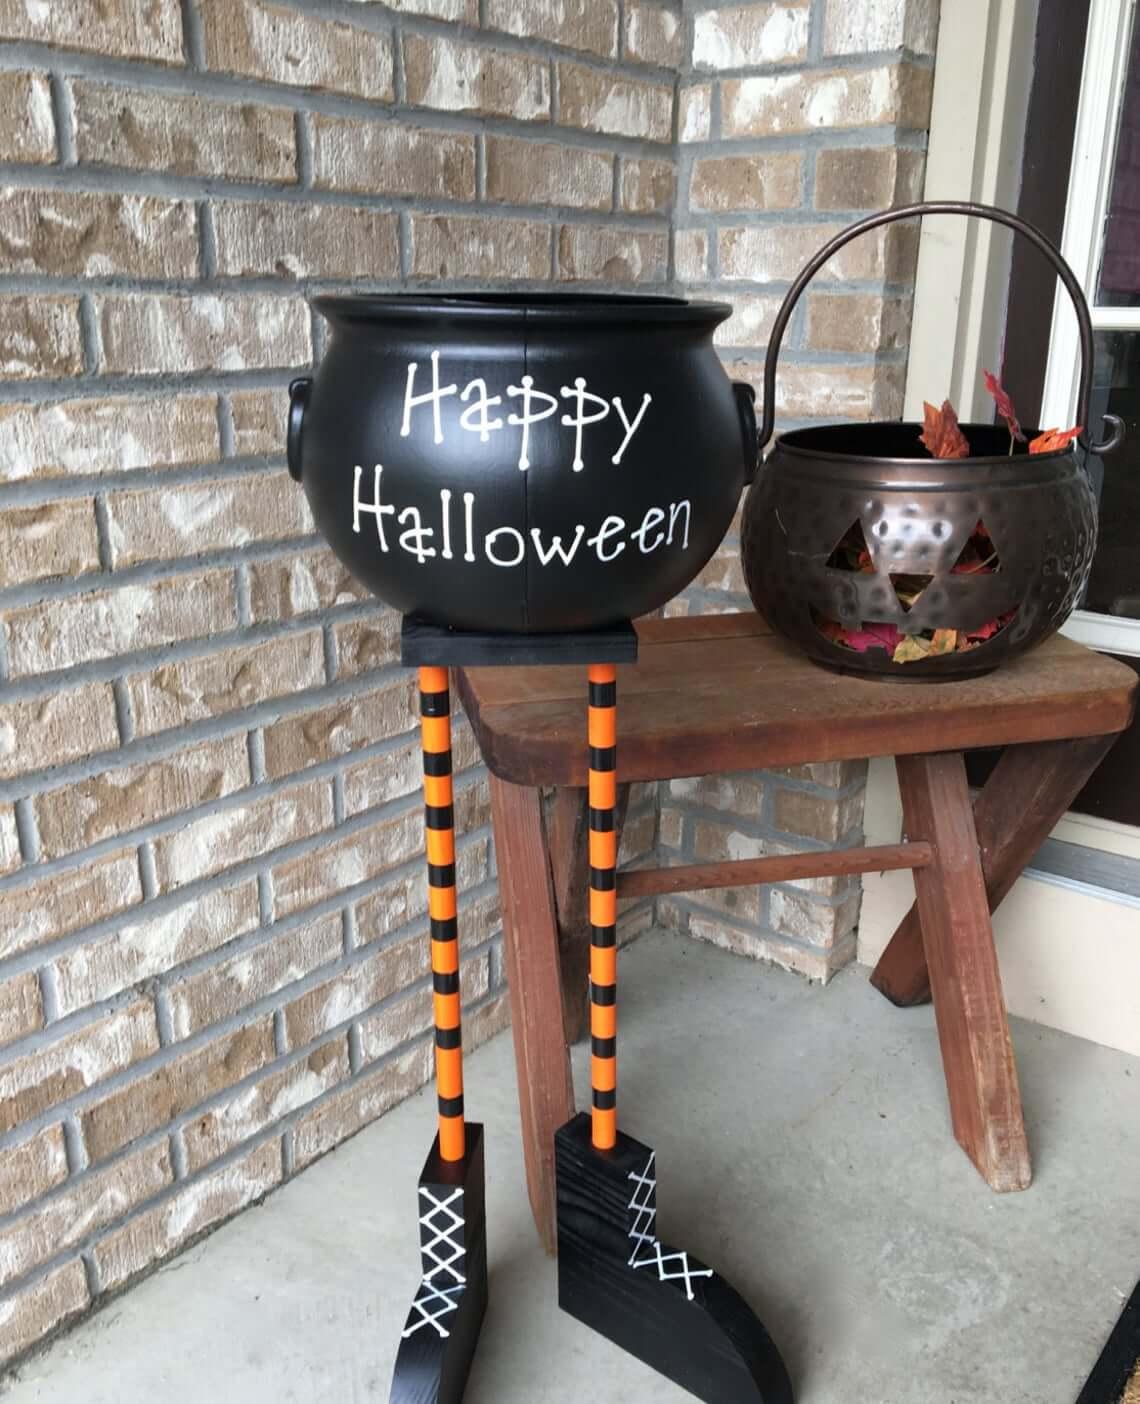 Witches Feet Happy Halloween Decorative Cauldron